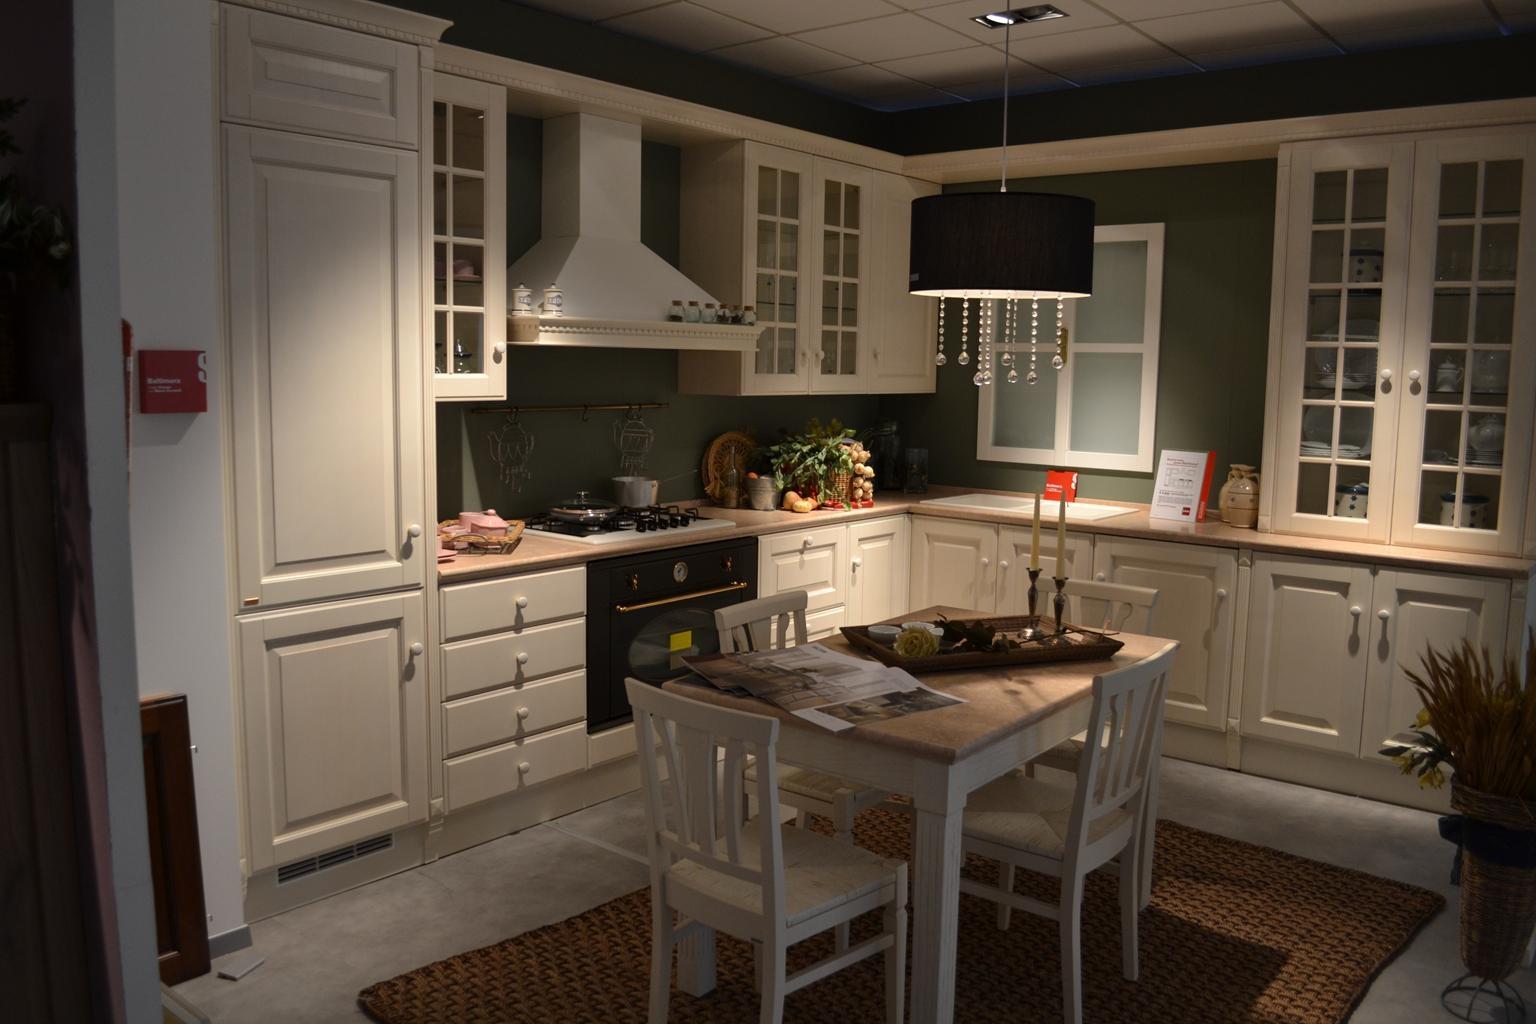 Lampadari cucina scavolini la collezione di - Cucina lampadari ...